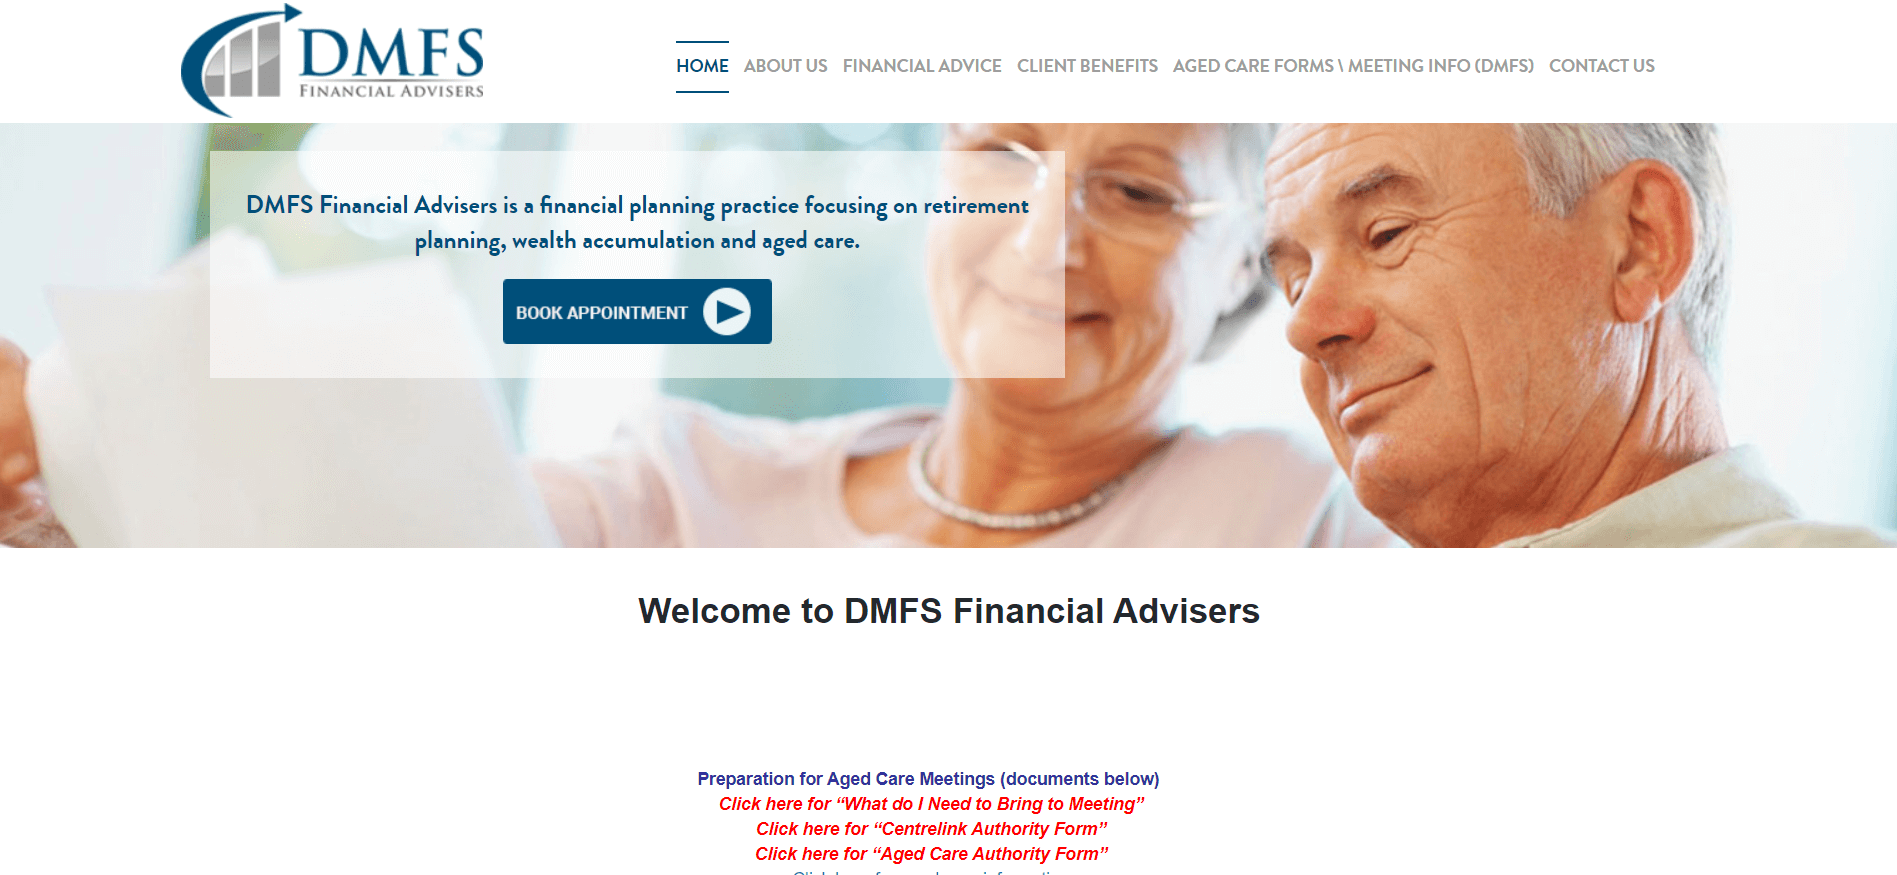 dmfs financial advisers